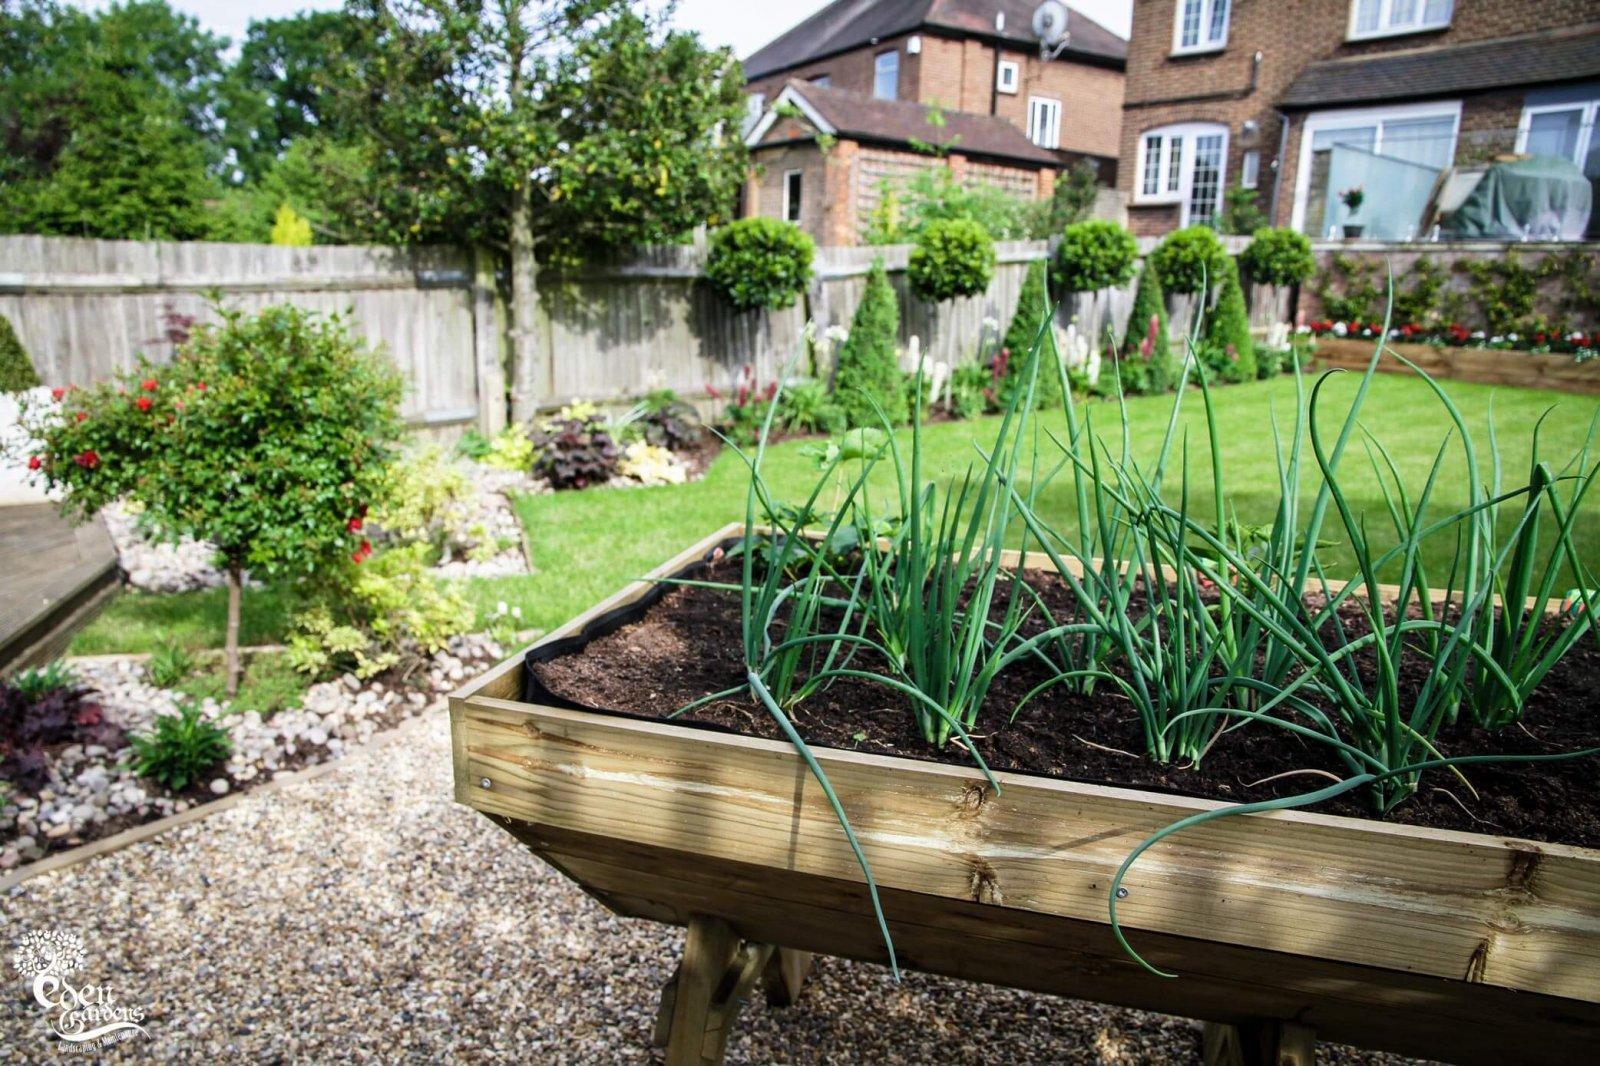 The Essentials of Garden Landscaping